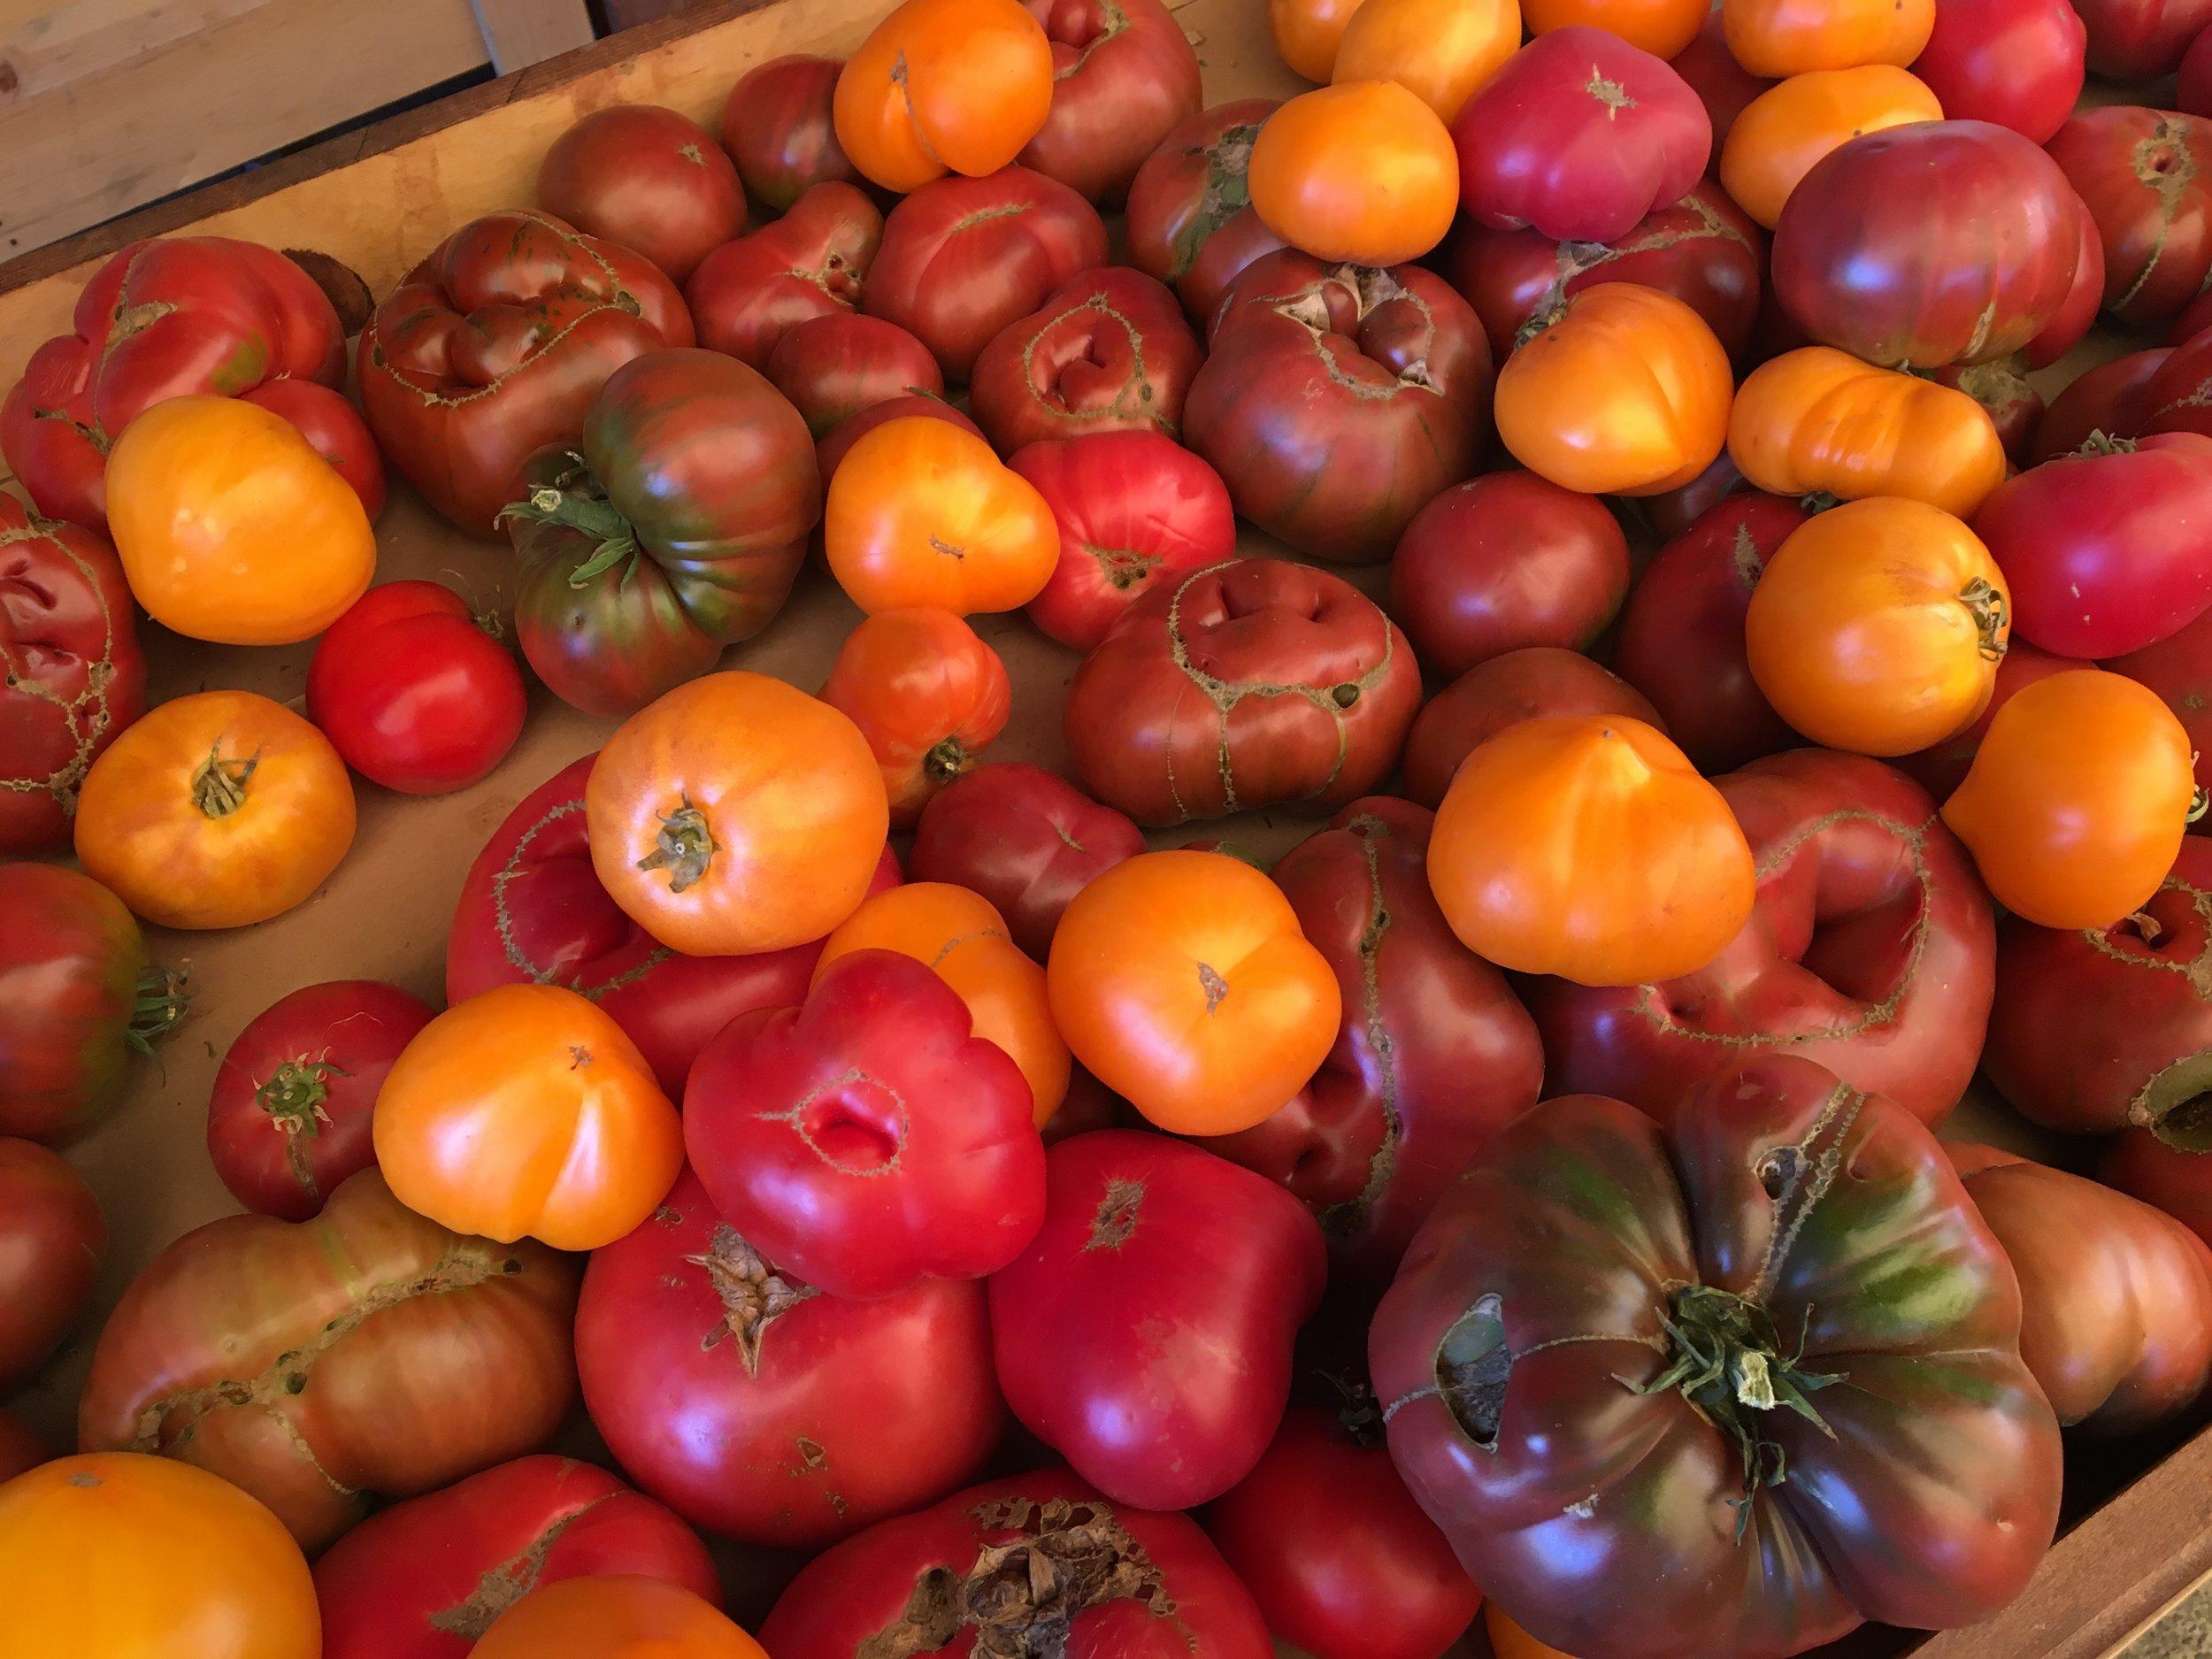 Look @ these heirloom tomatoes